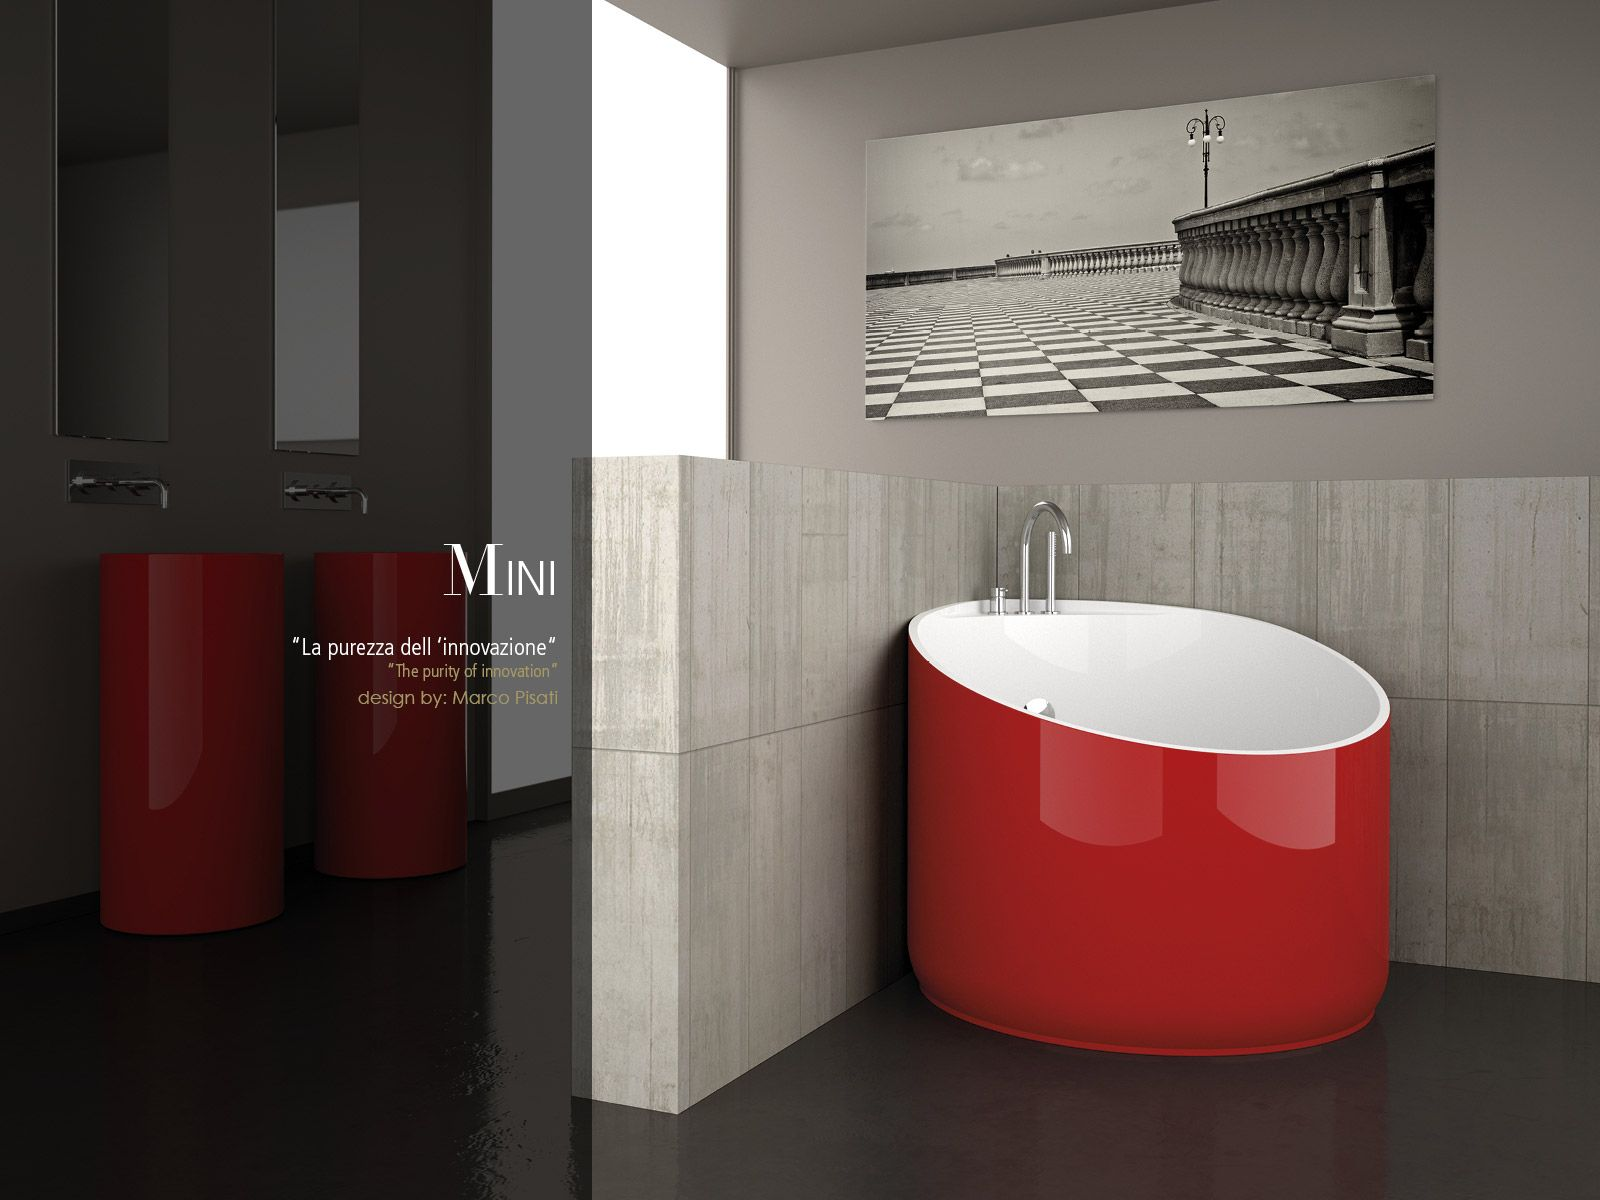 Vasca Da Bagno Mini : Small corner bathtub mini from da vinci tuscany brand